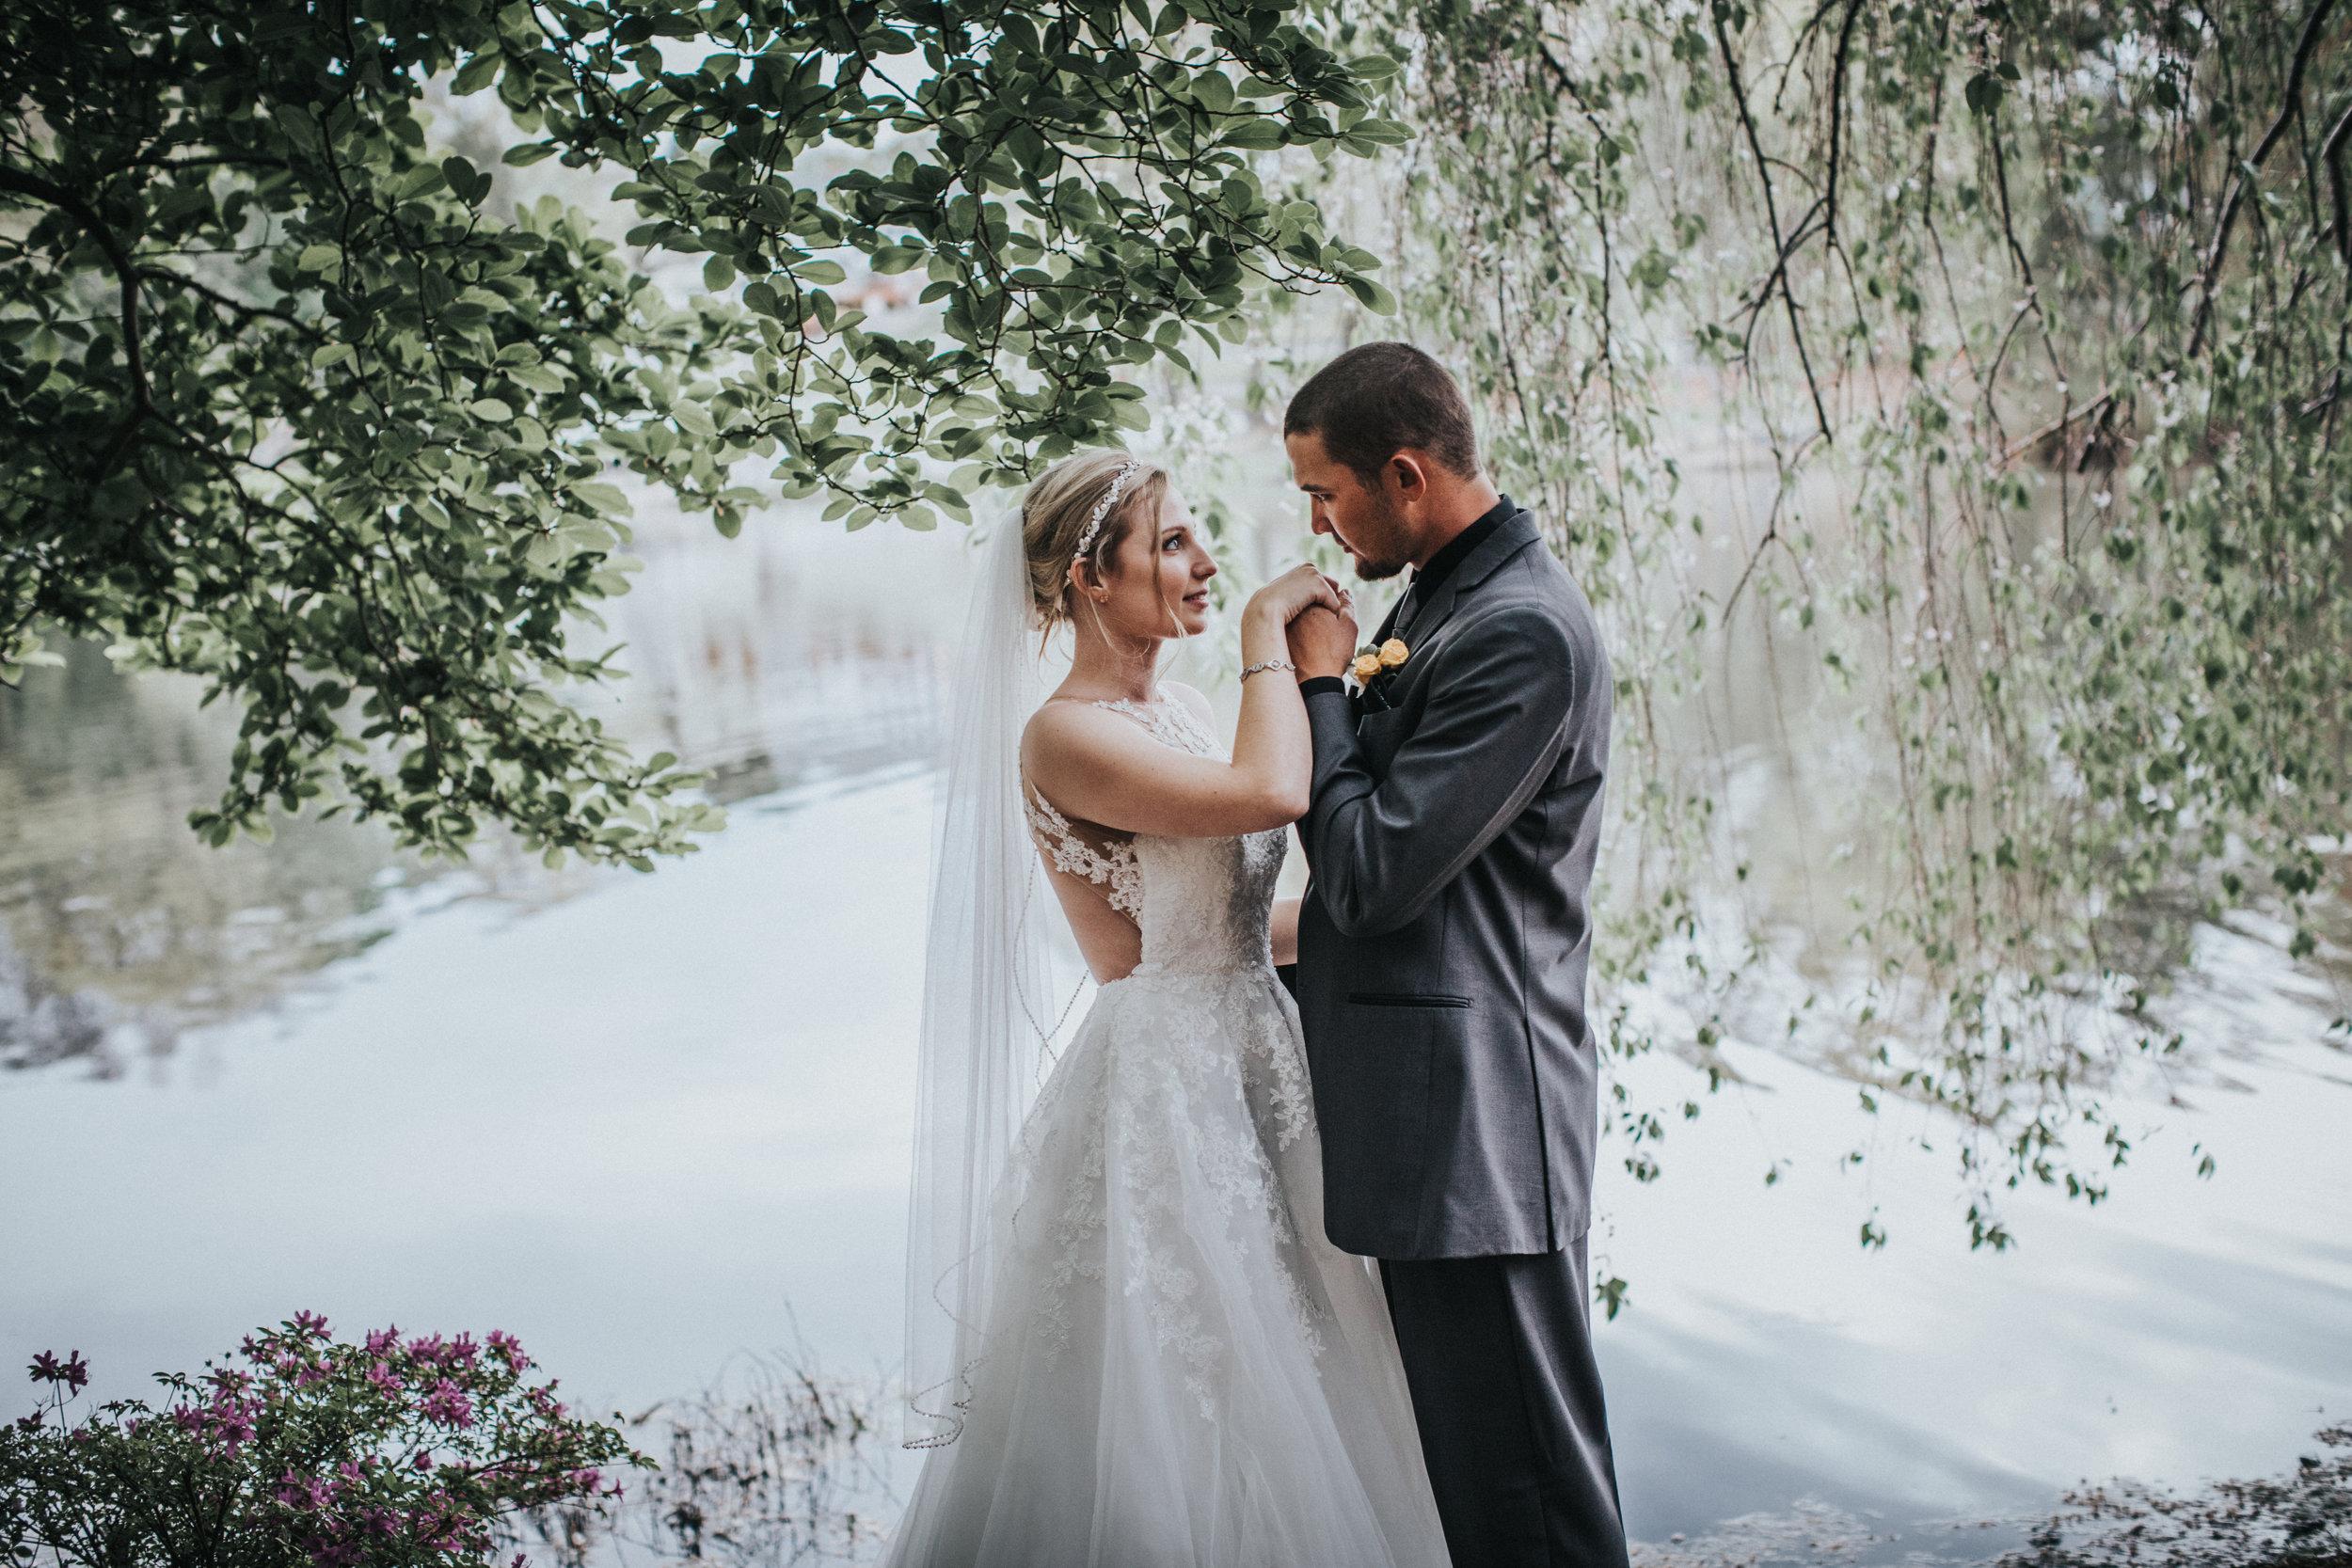 New-Jersey-Wedding-Photographer-Megan&Nick-BrideandGroom-42.jpg